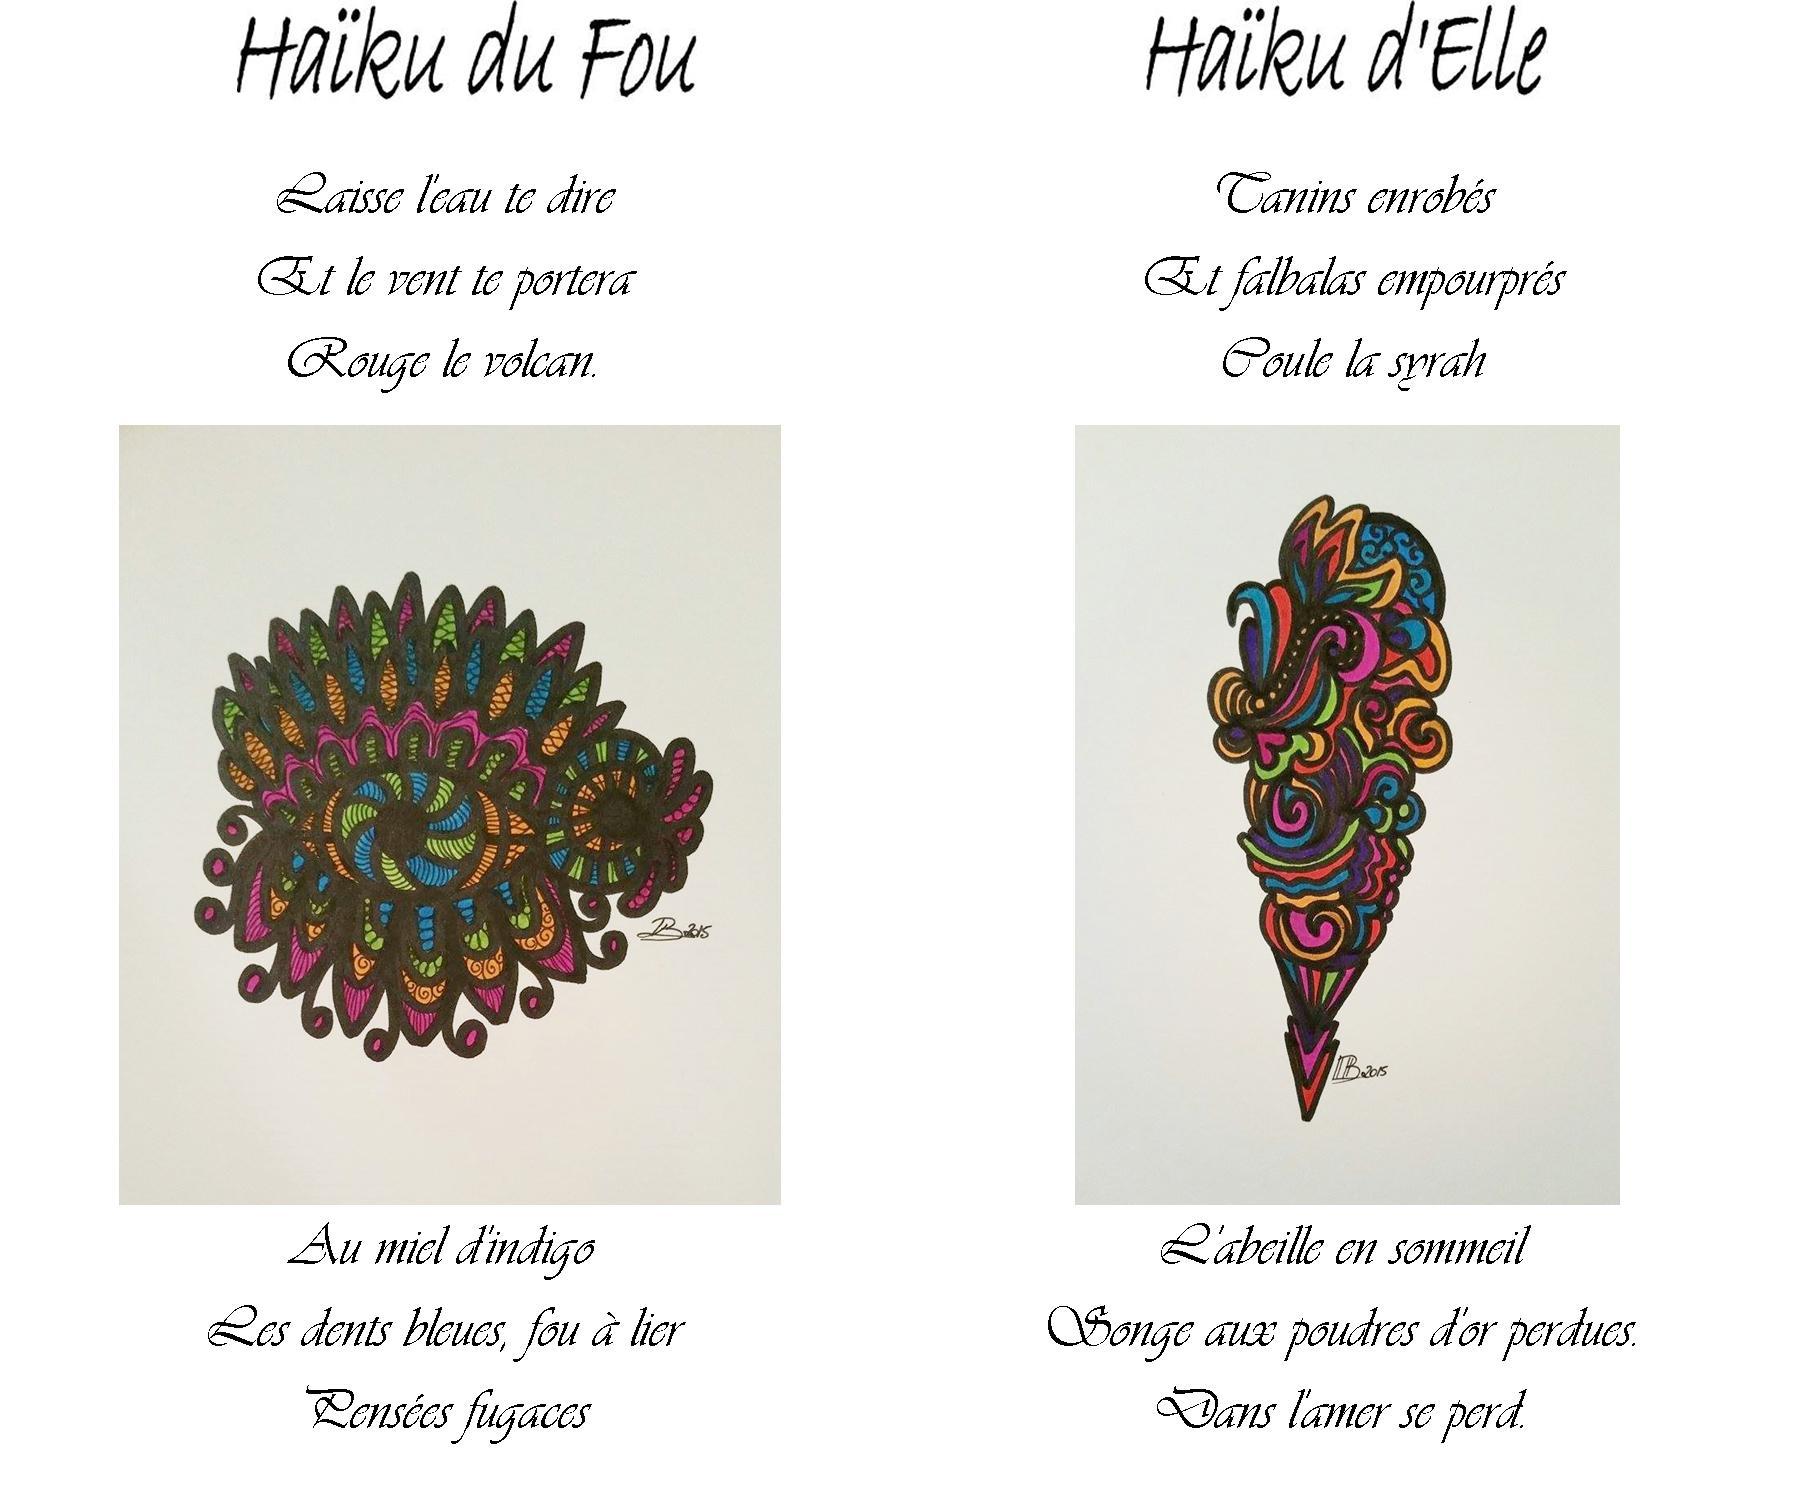 haiku mix 3